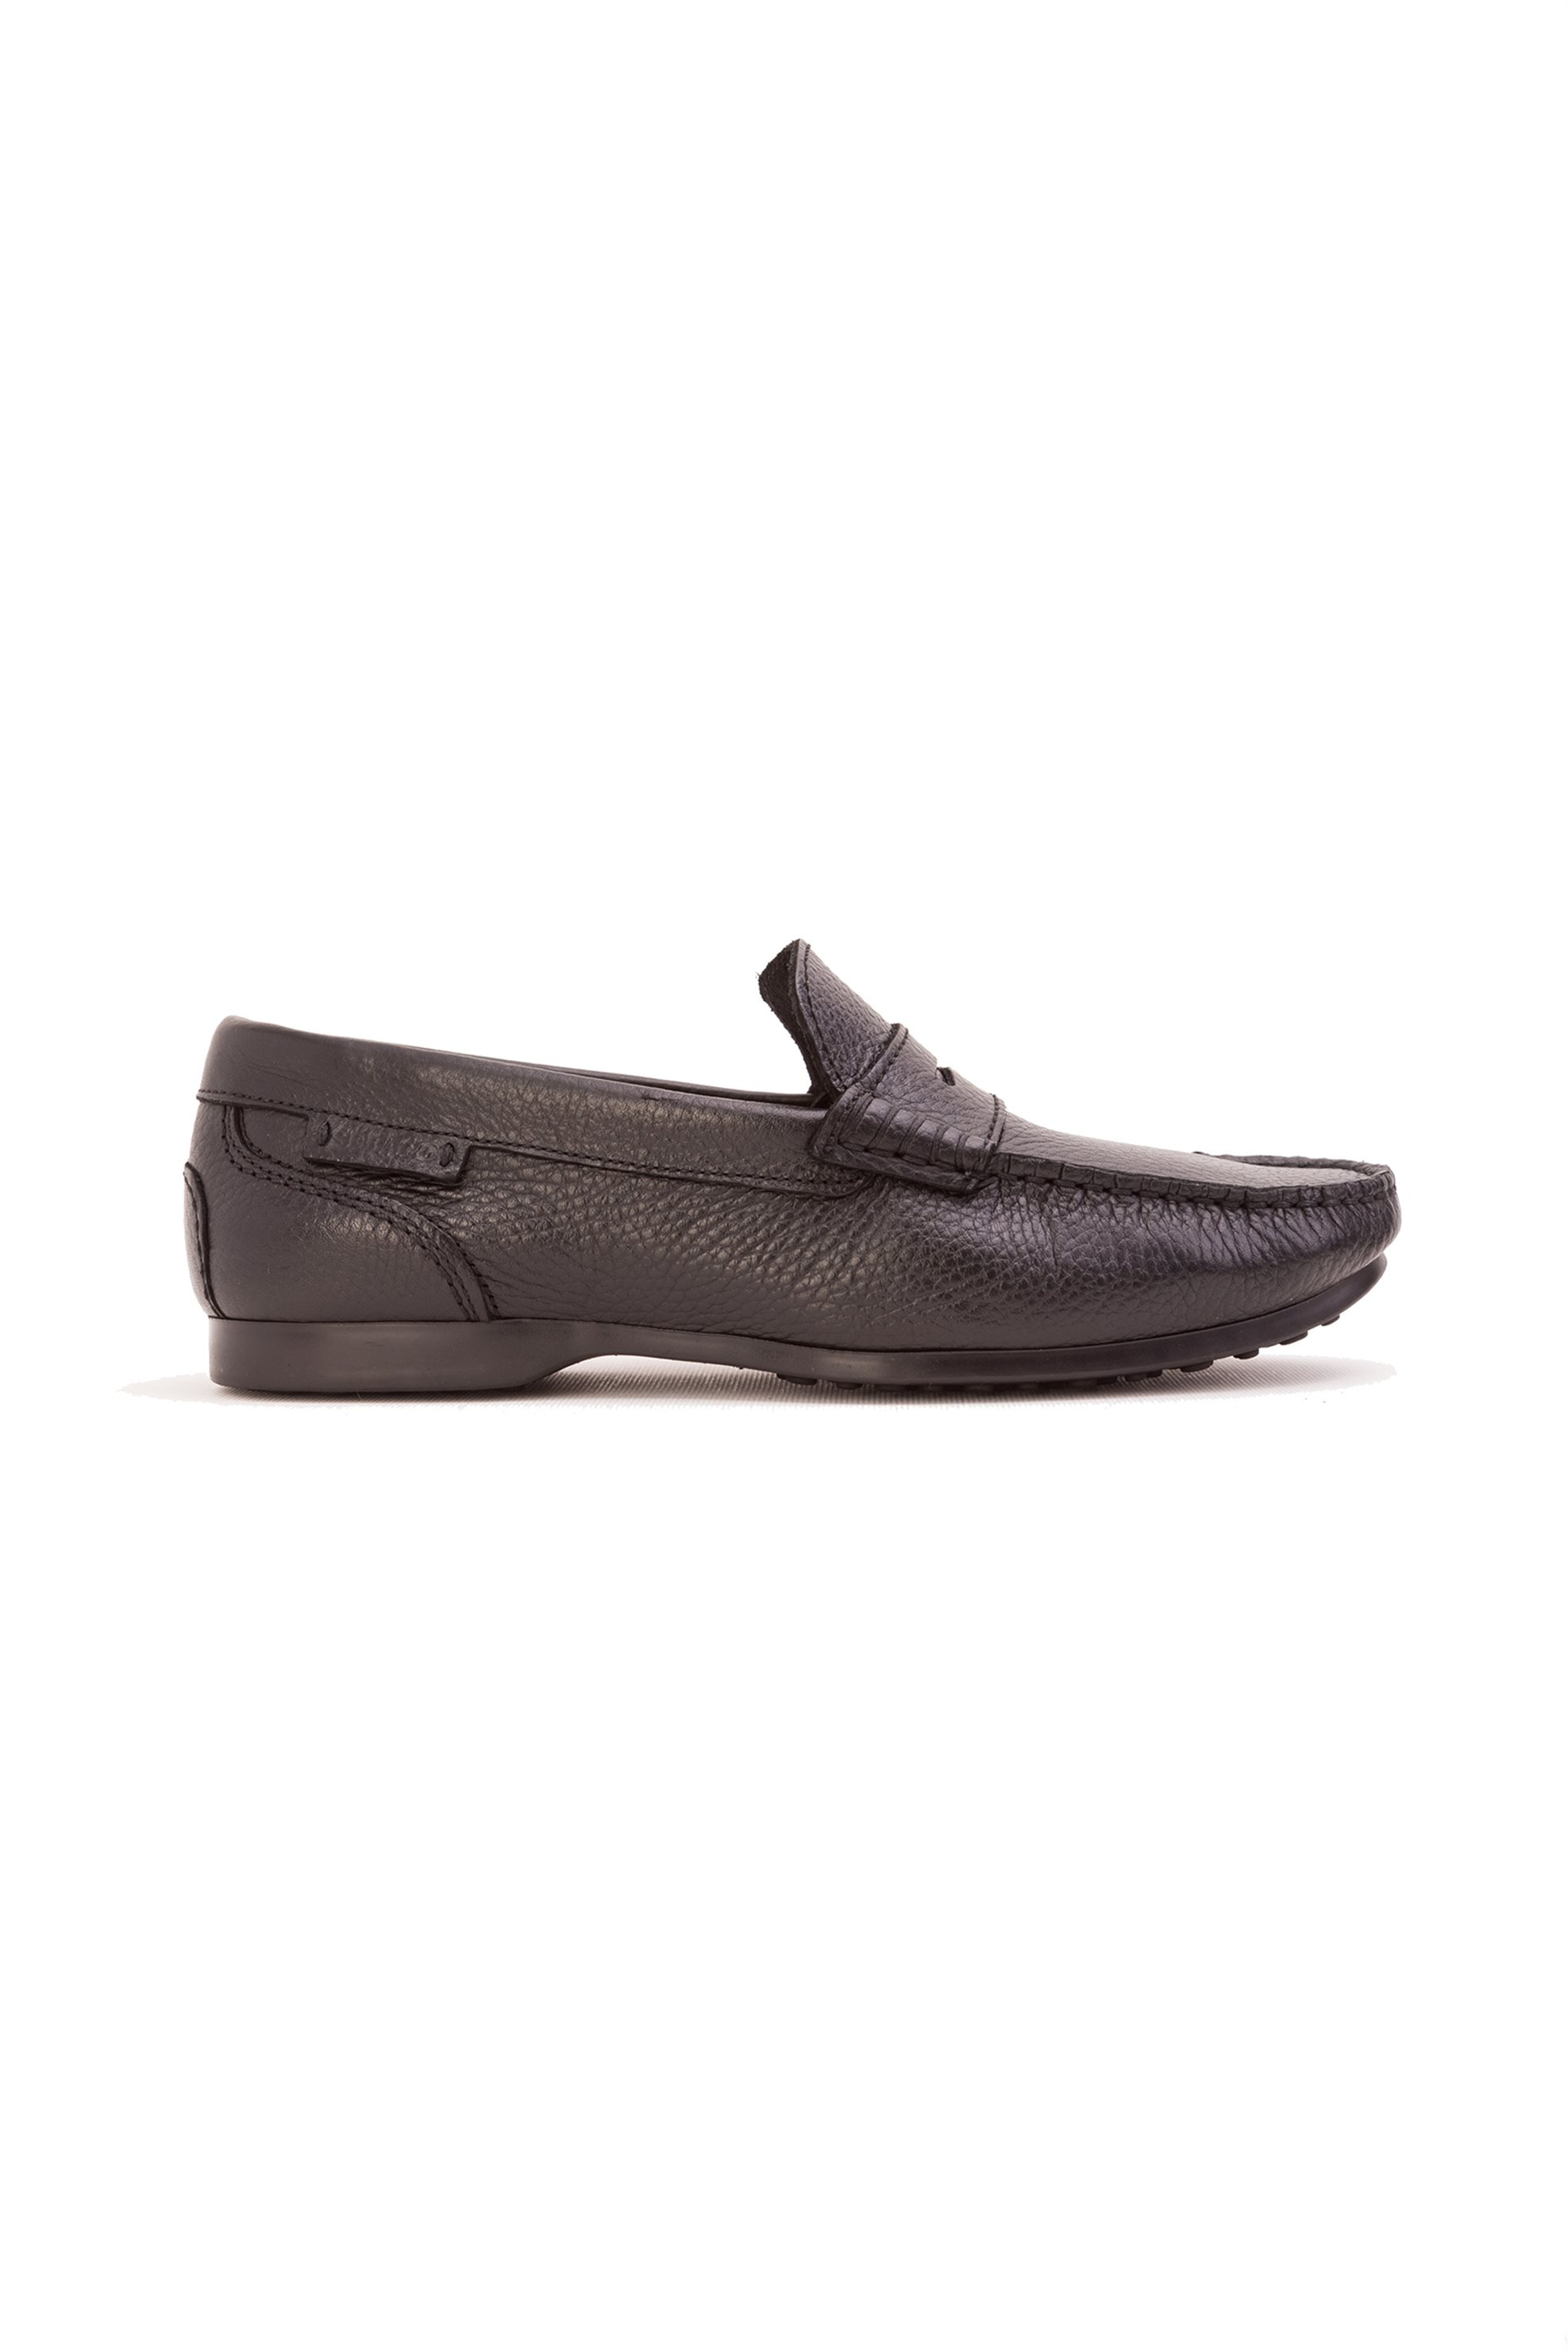 2cca2e546b5 Notos Ανδρικά loafers με σαγρέ δέρμα Sebago - B160062 - Μαύρο